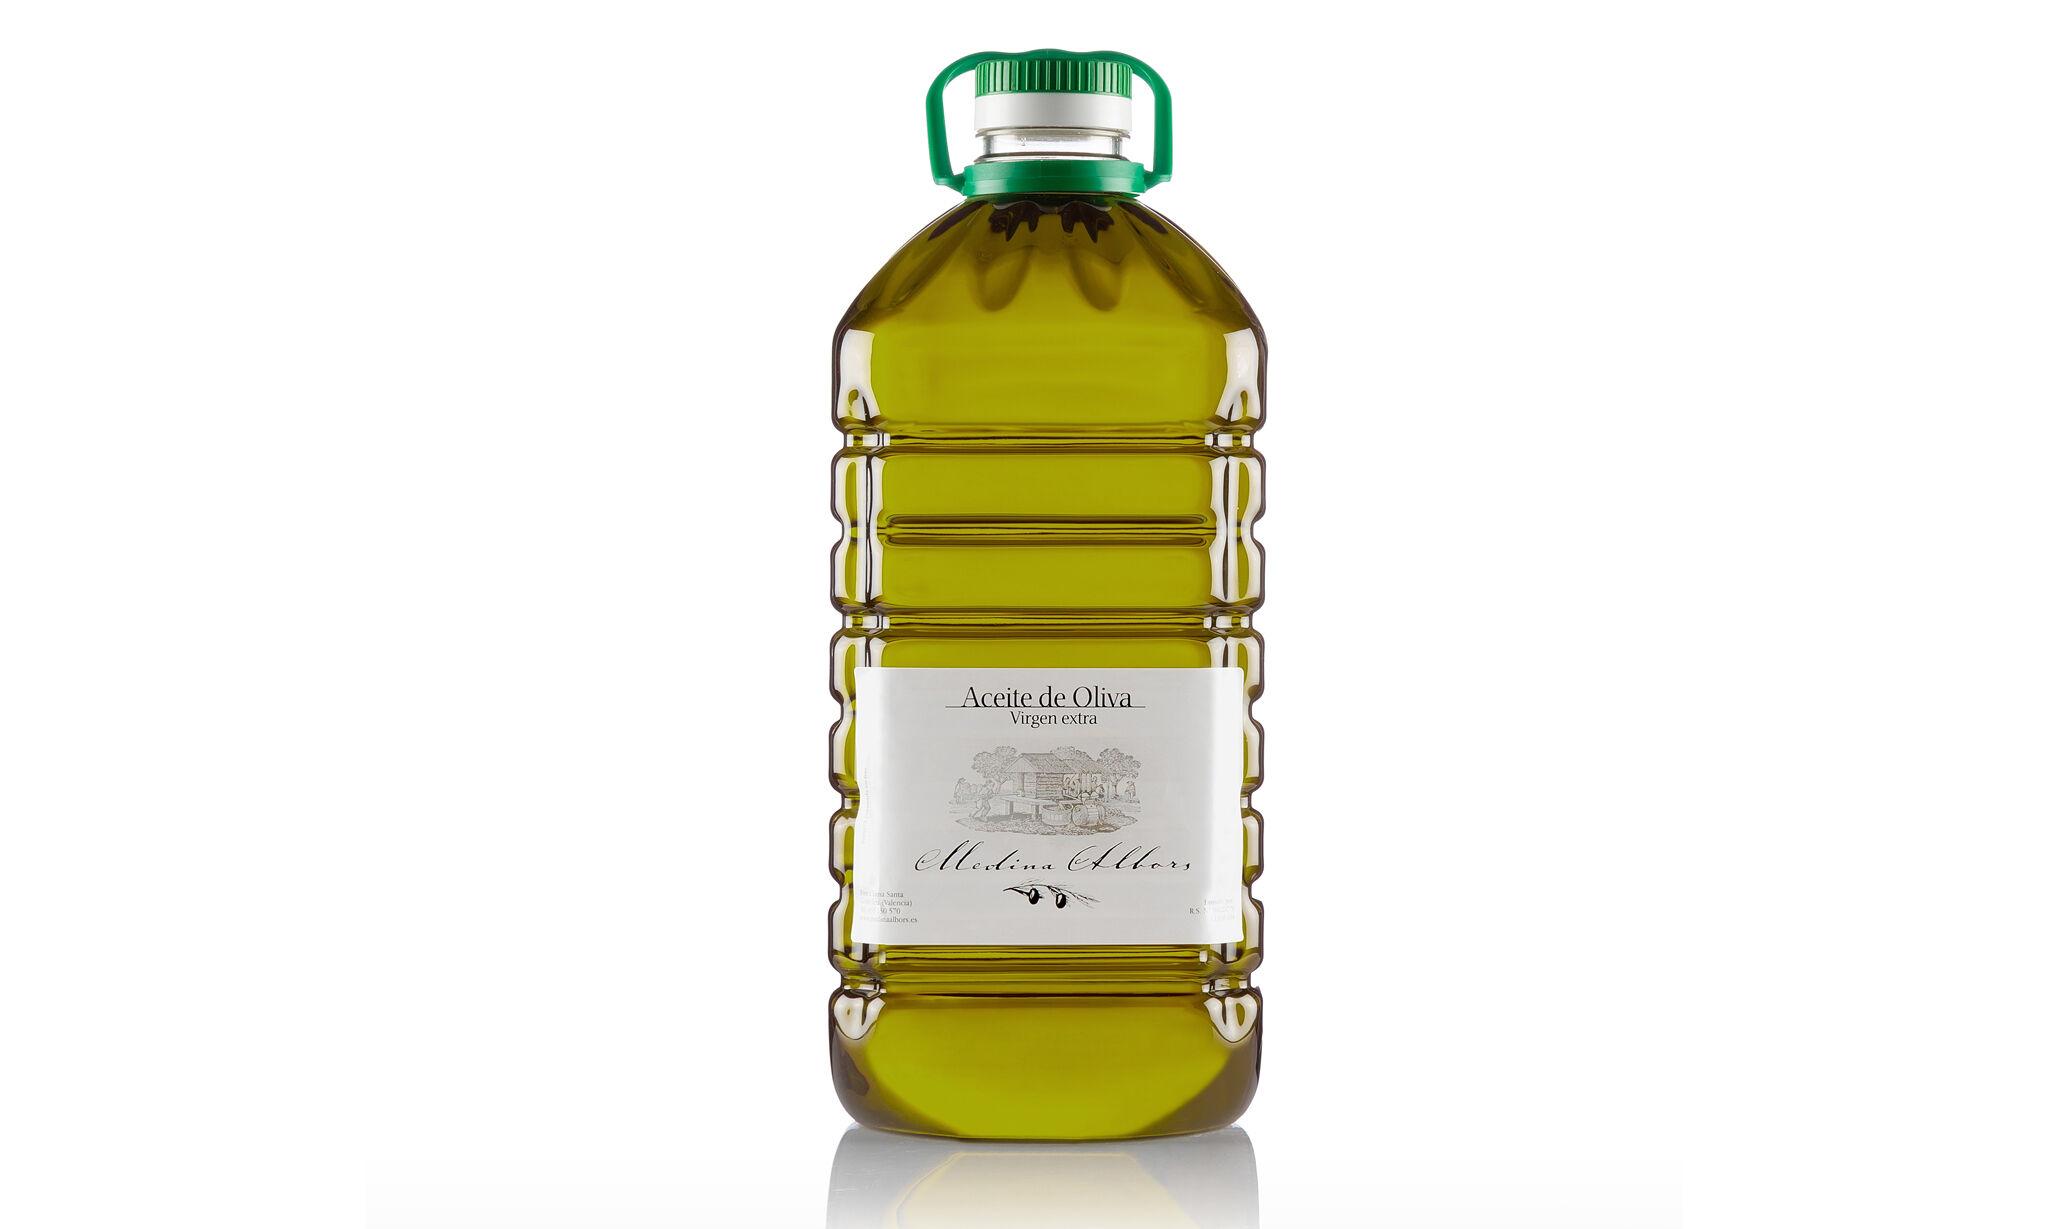 Huile d'Olive Extra Vierge Medina Albors 5 L